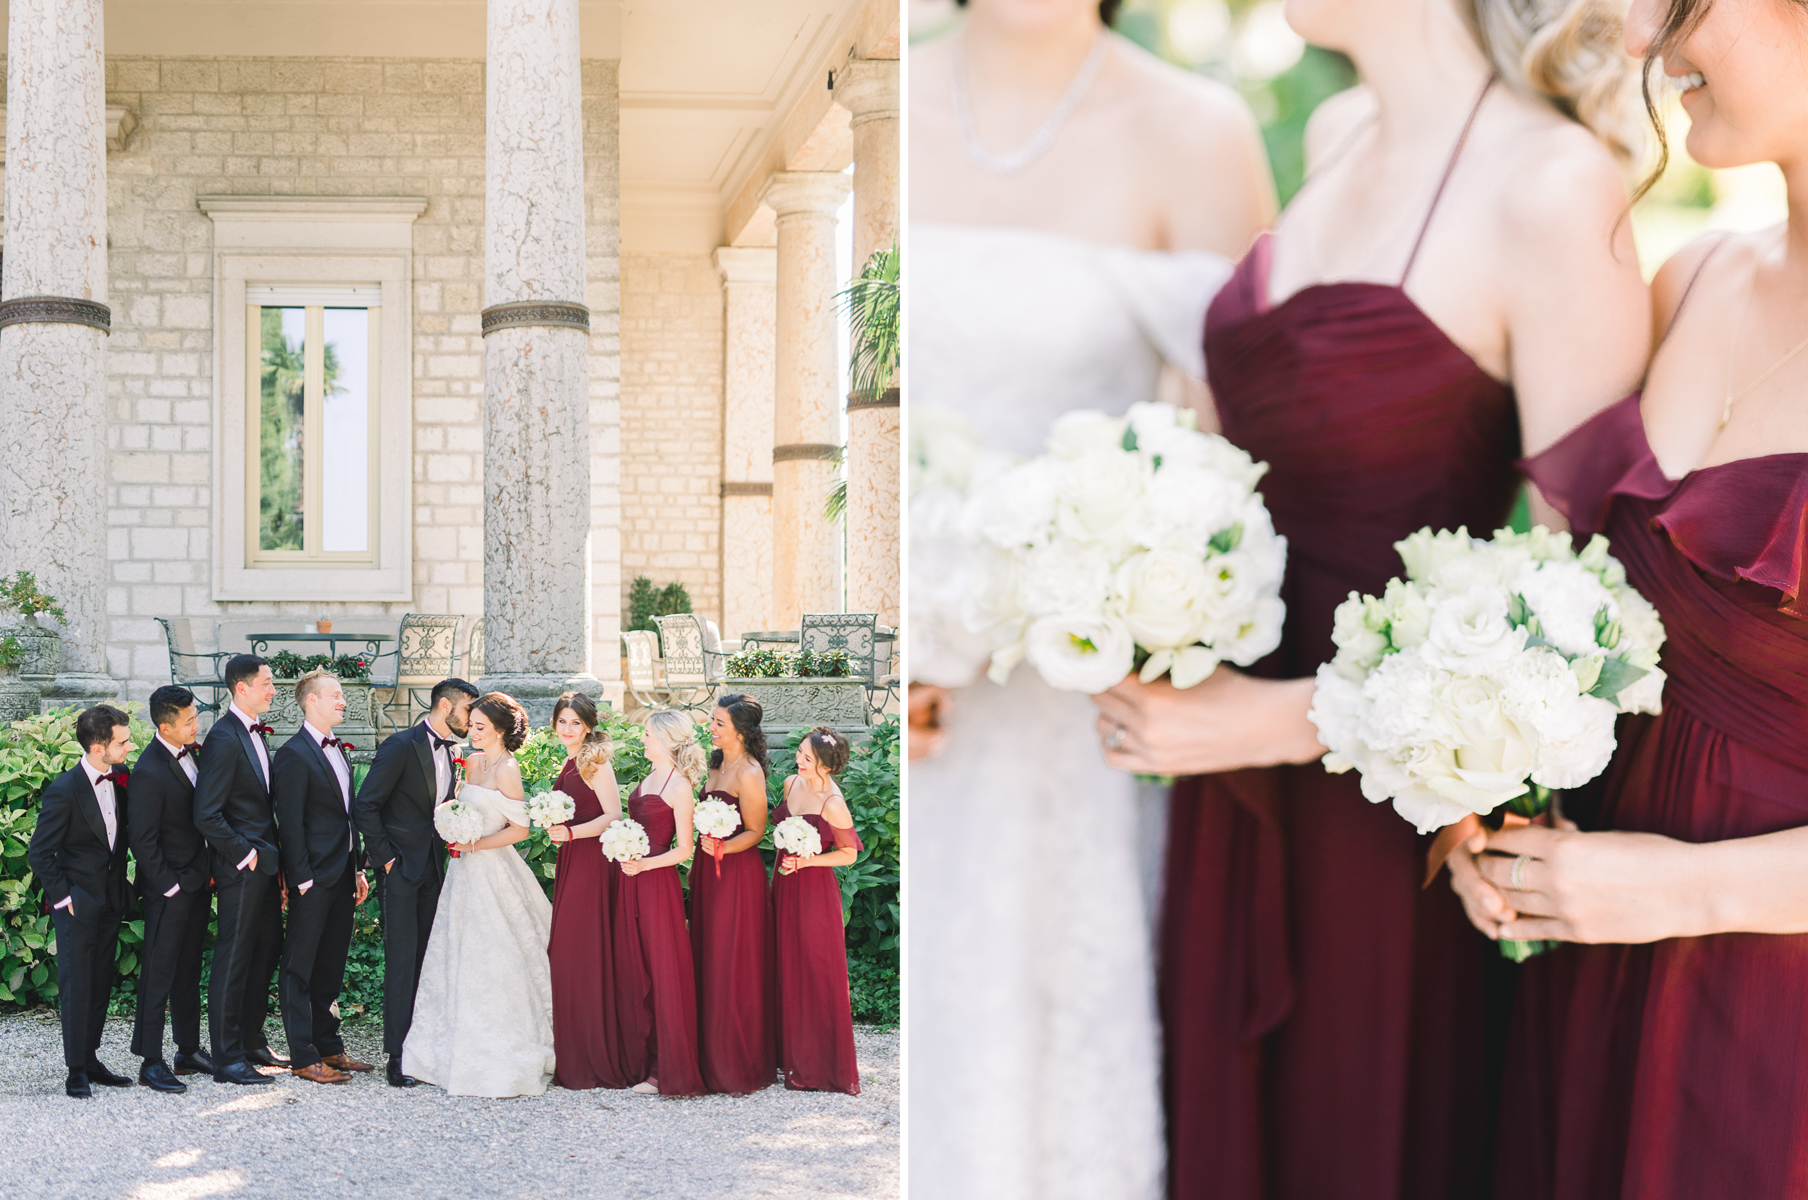 Palace_Villa_Cortine_Hotel_Italian_Wedding_Photographer_Sirmione_AKP-16.jpg